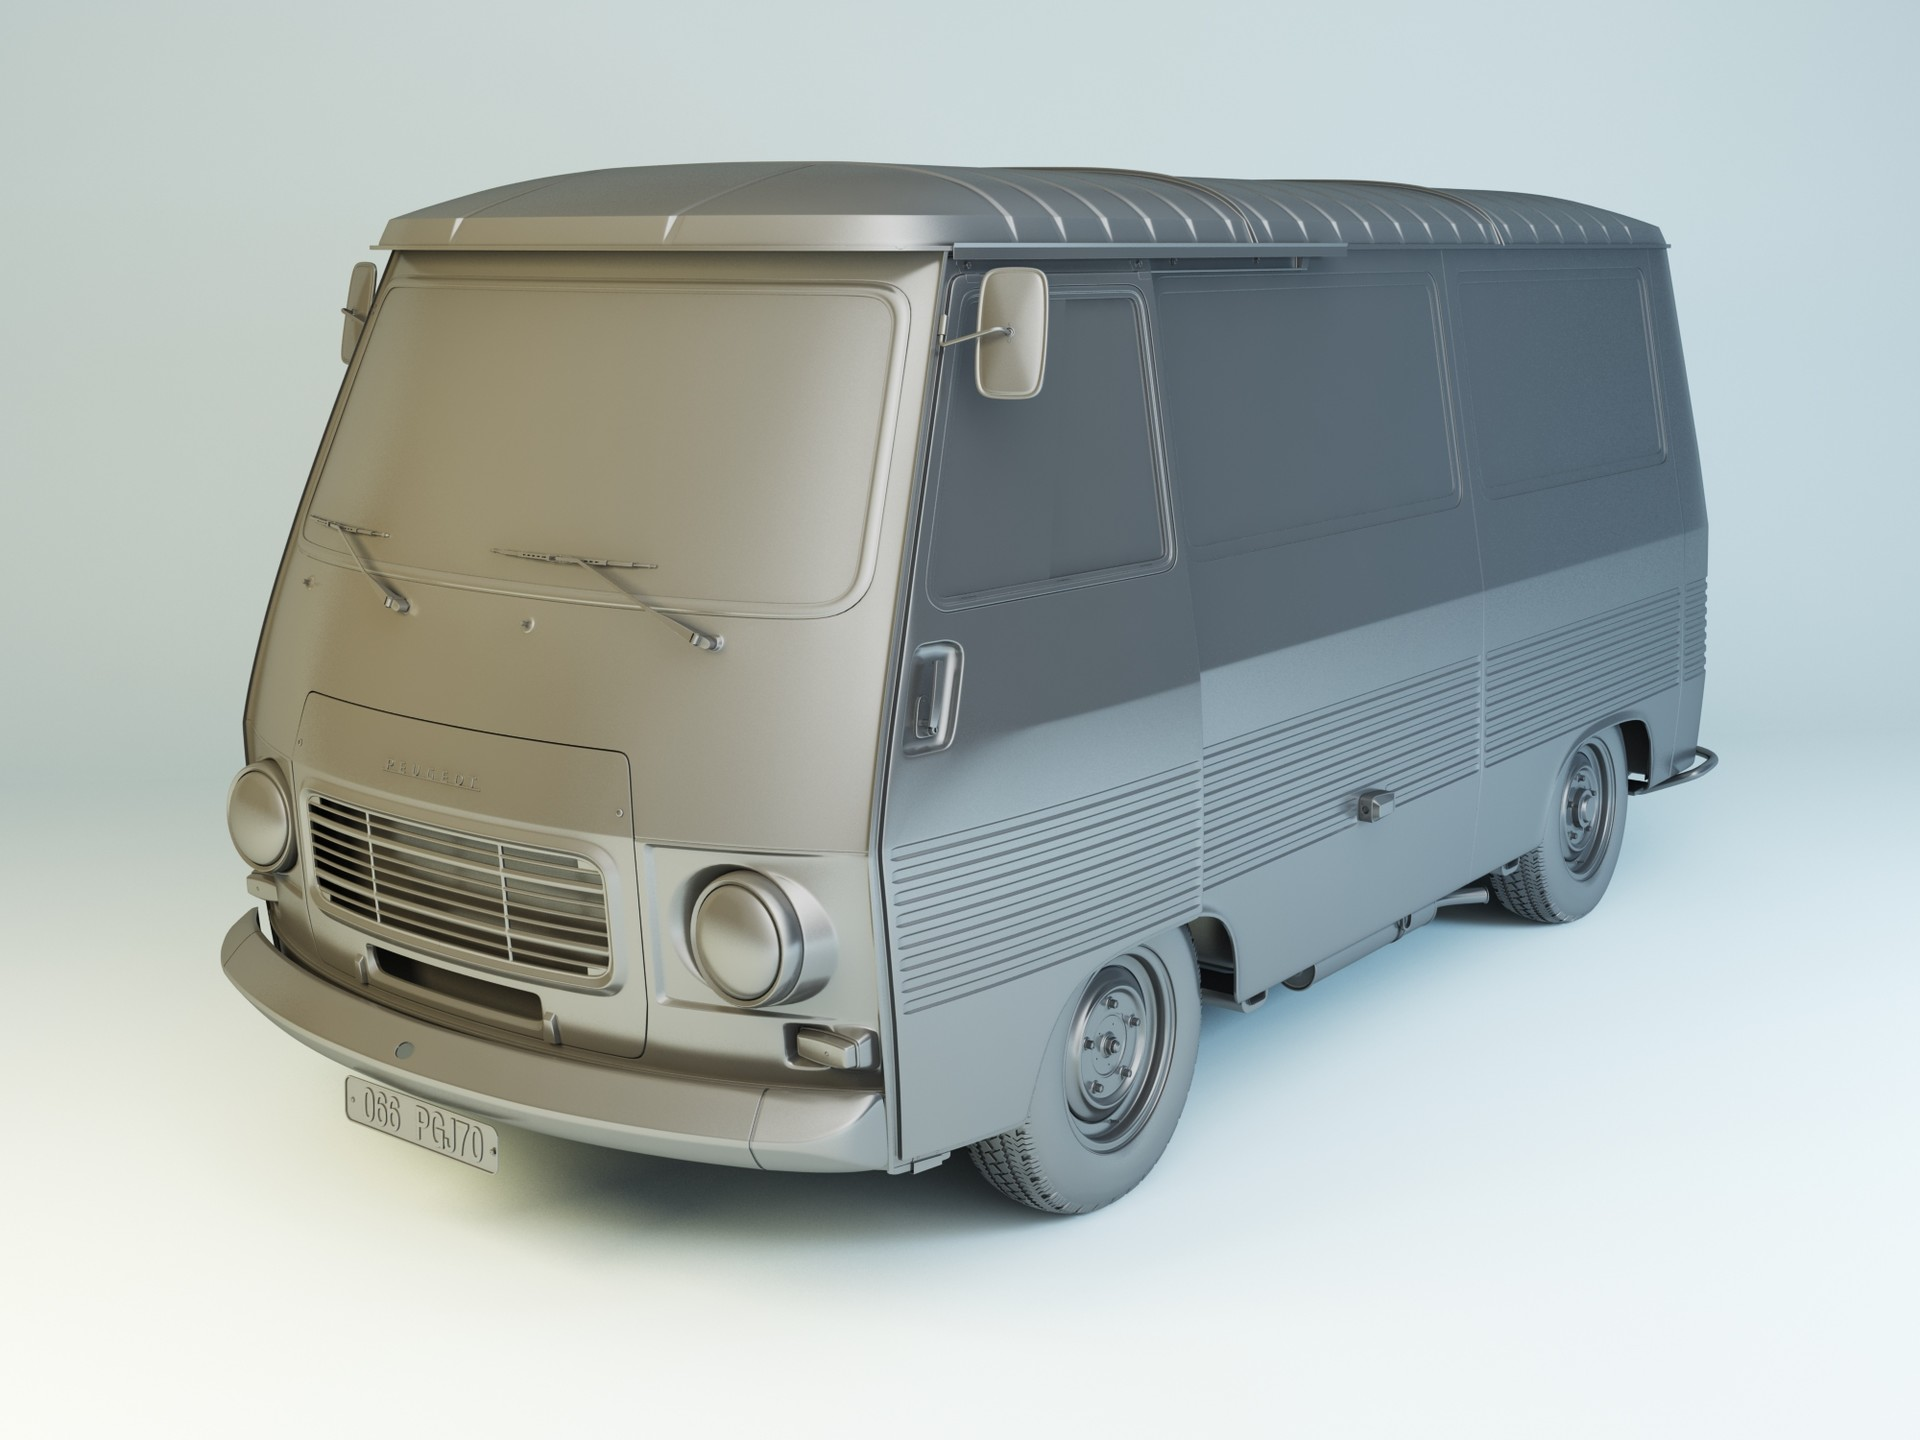 Nail khusnutdinov pwc 066 000 peugeot j7 modelling 0